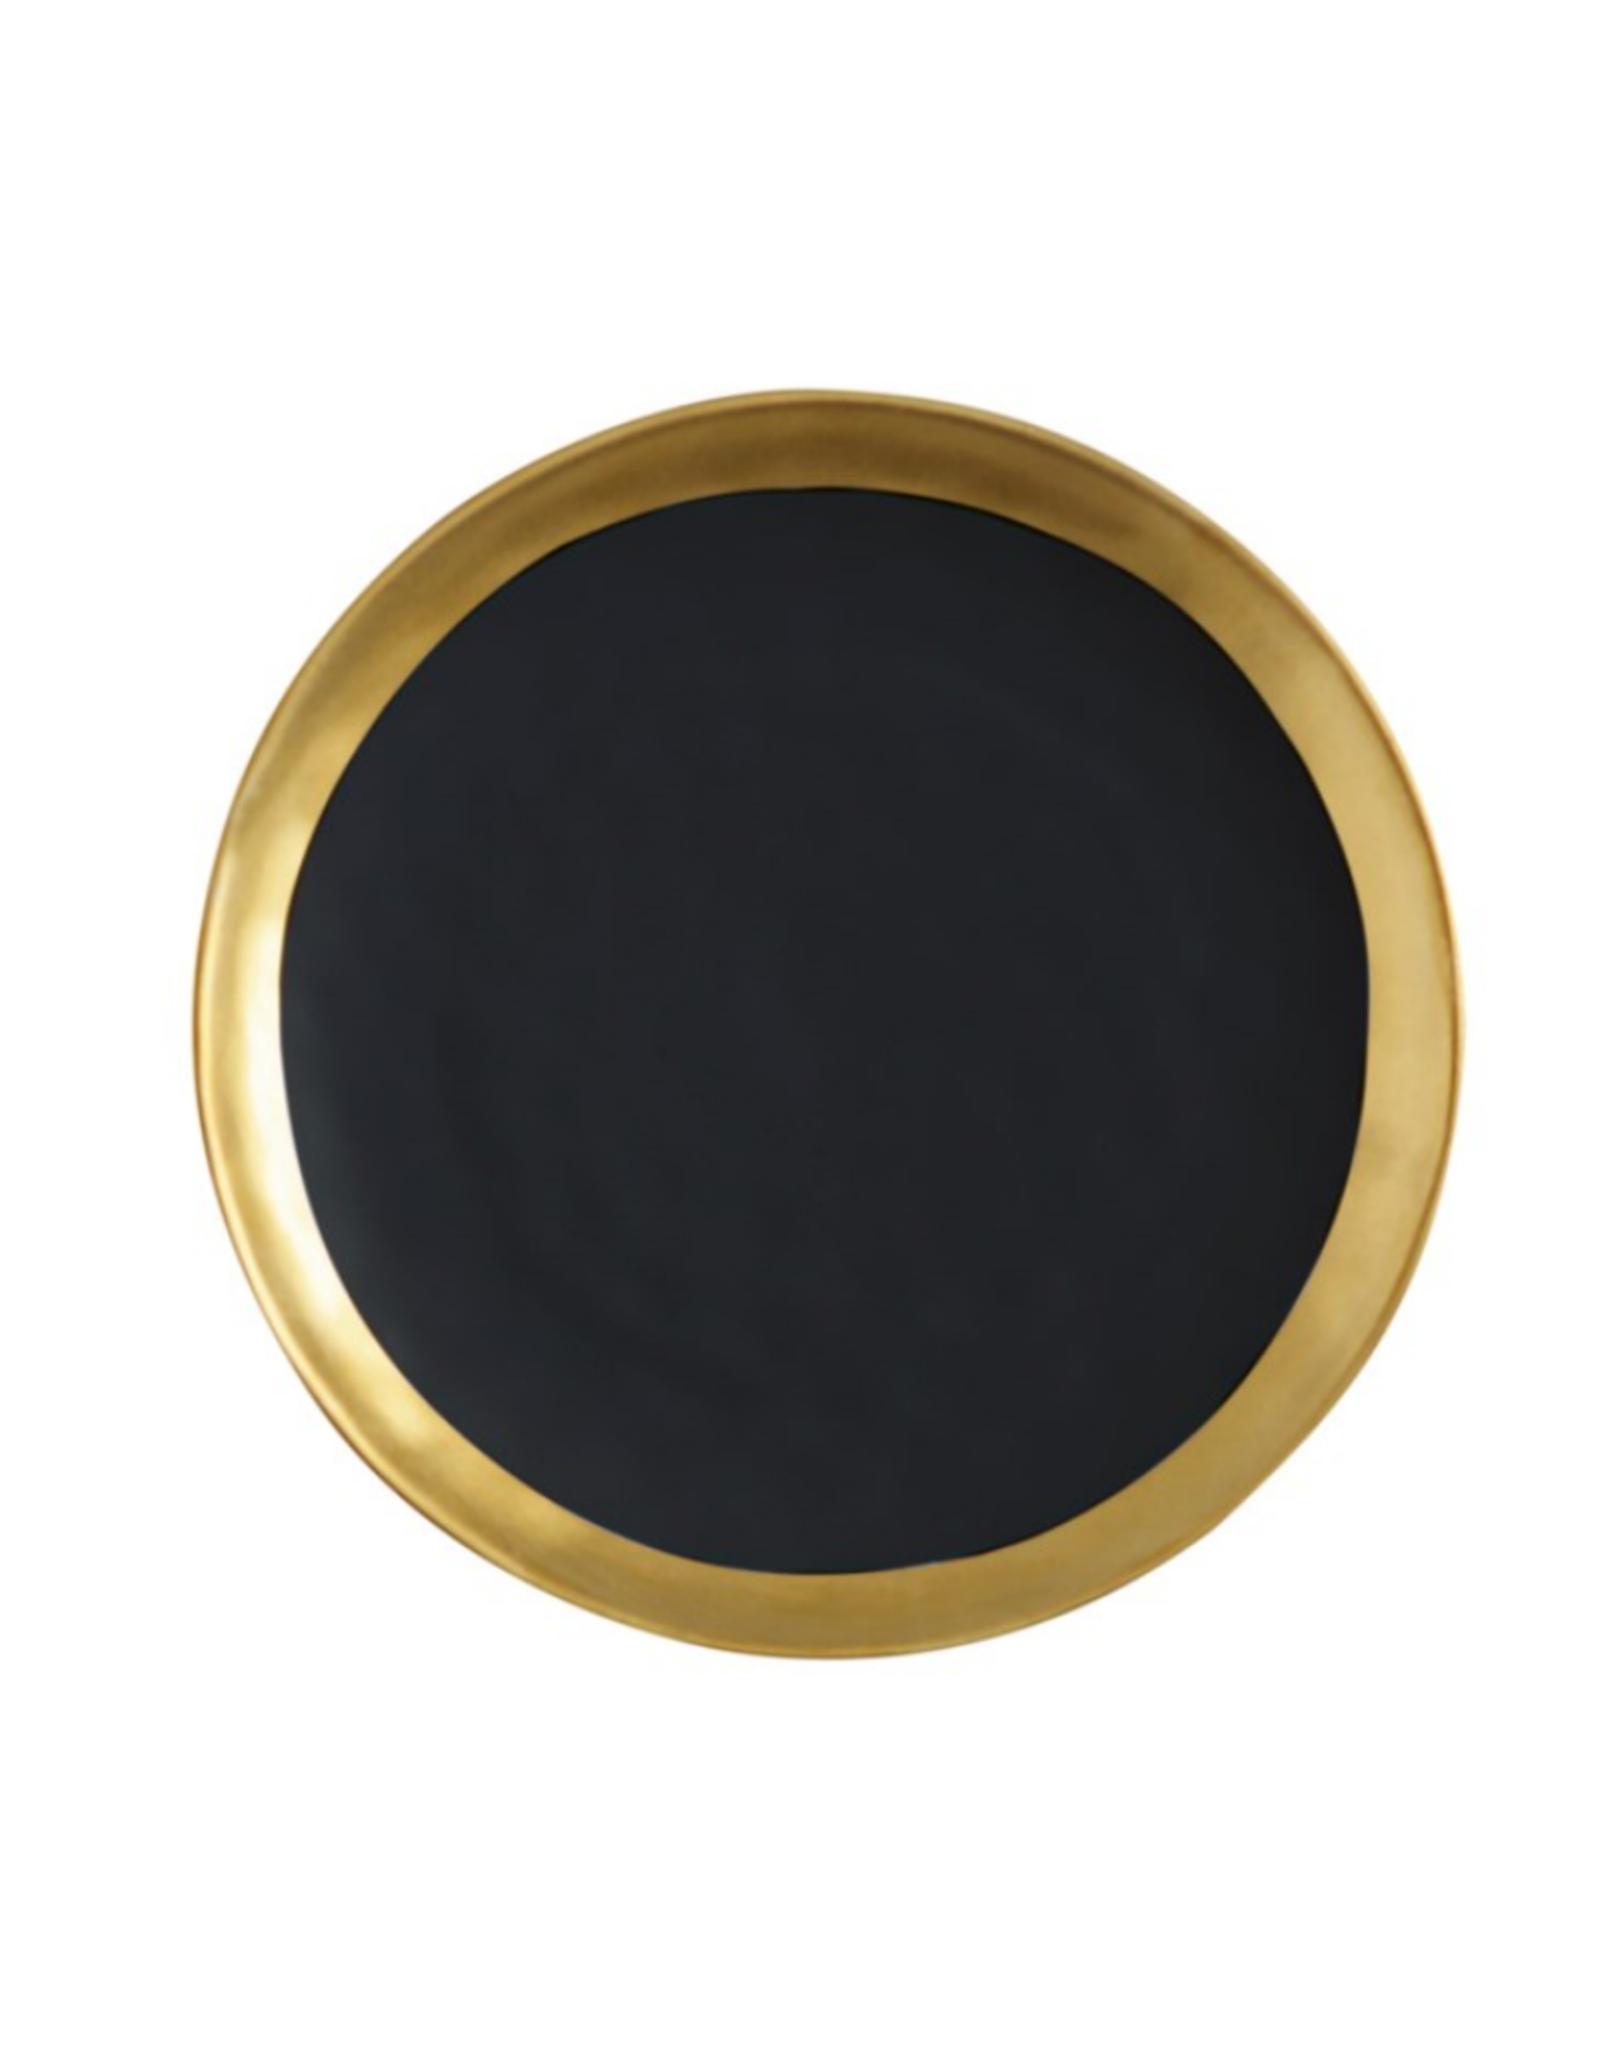 Maxwell Williams Assiette 'Swank' 16CM noir et or